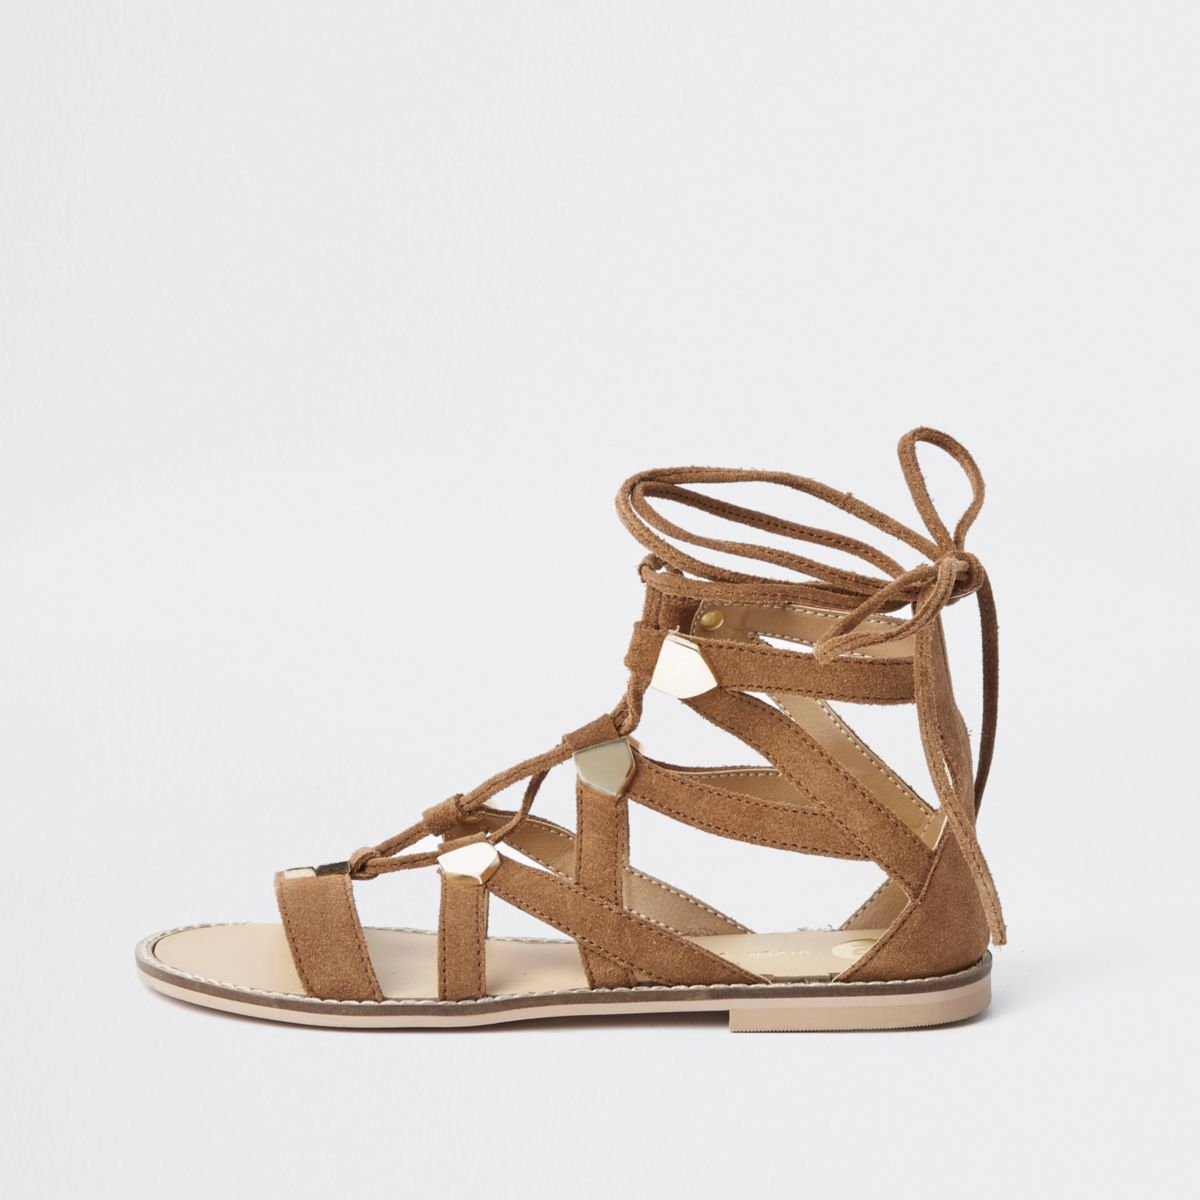 Brown suede caged tie up sandals